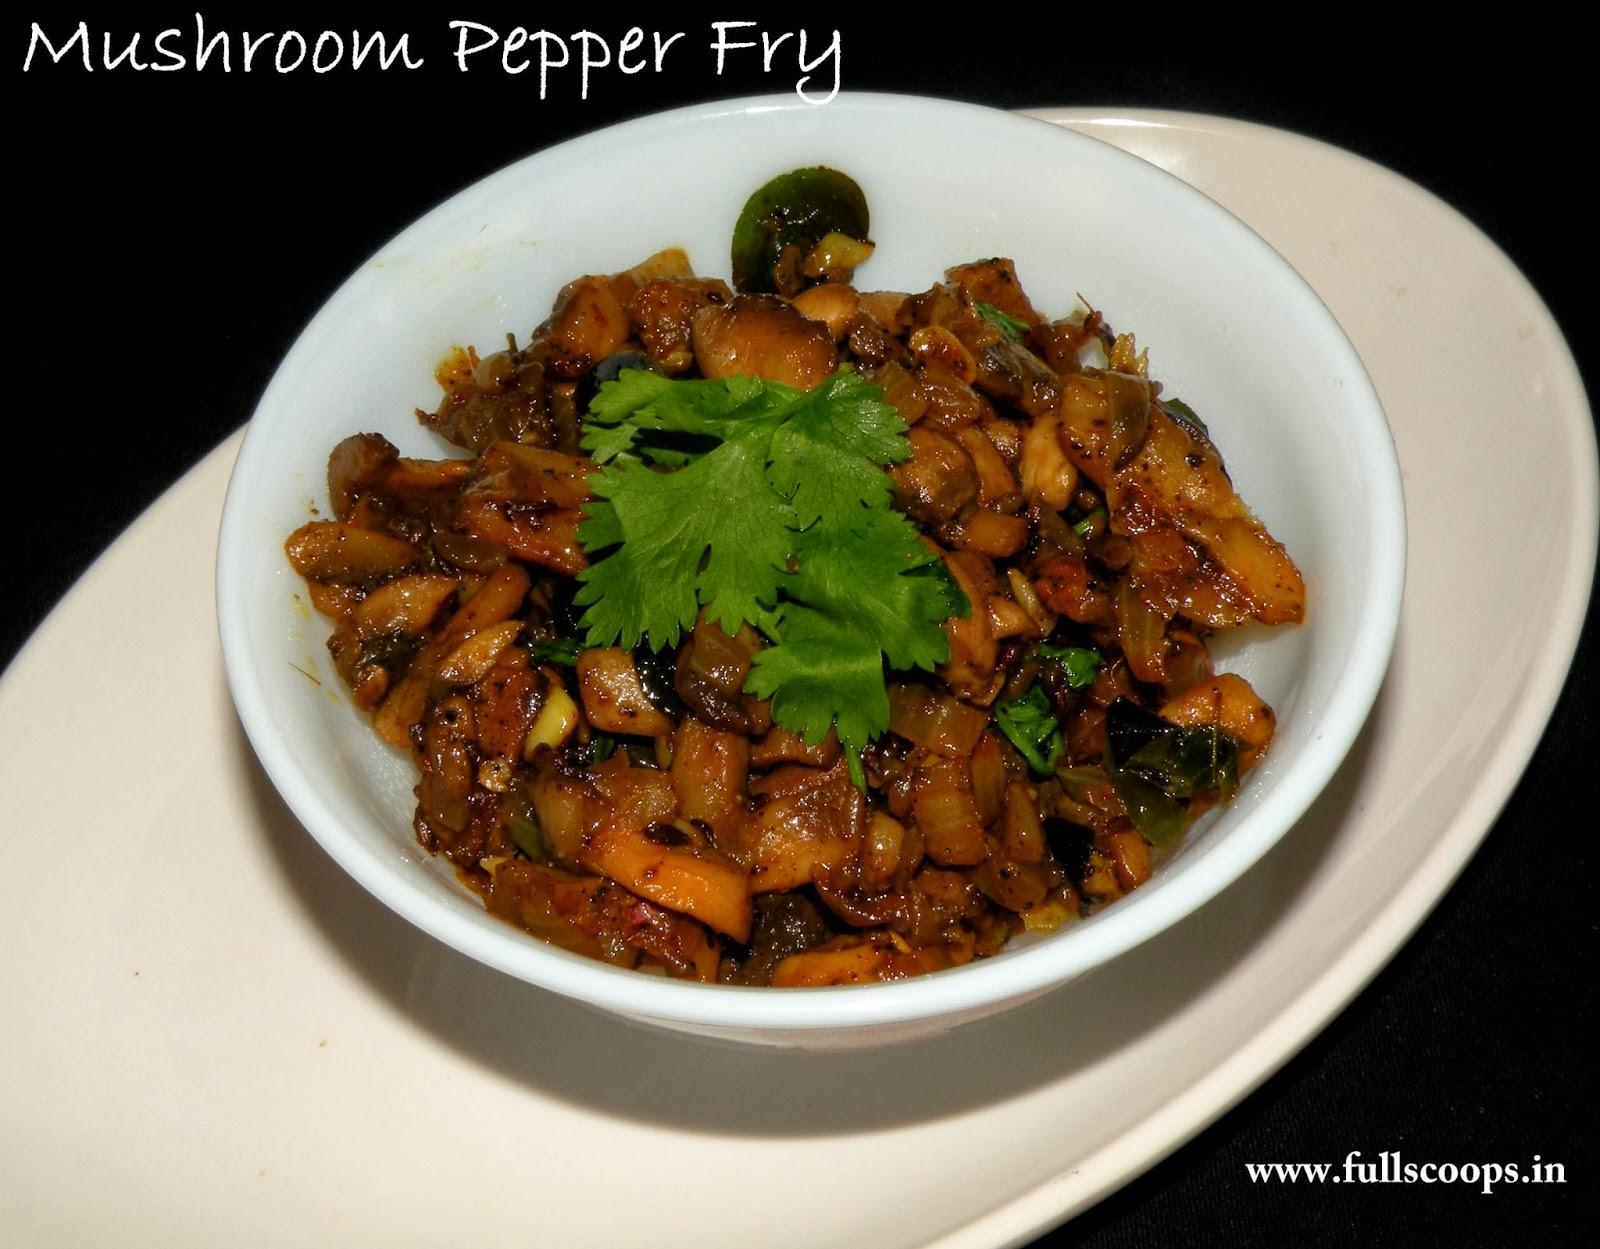 Mushroom Pepper Fry